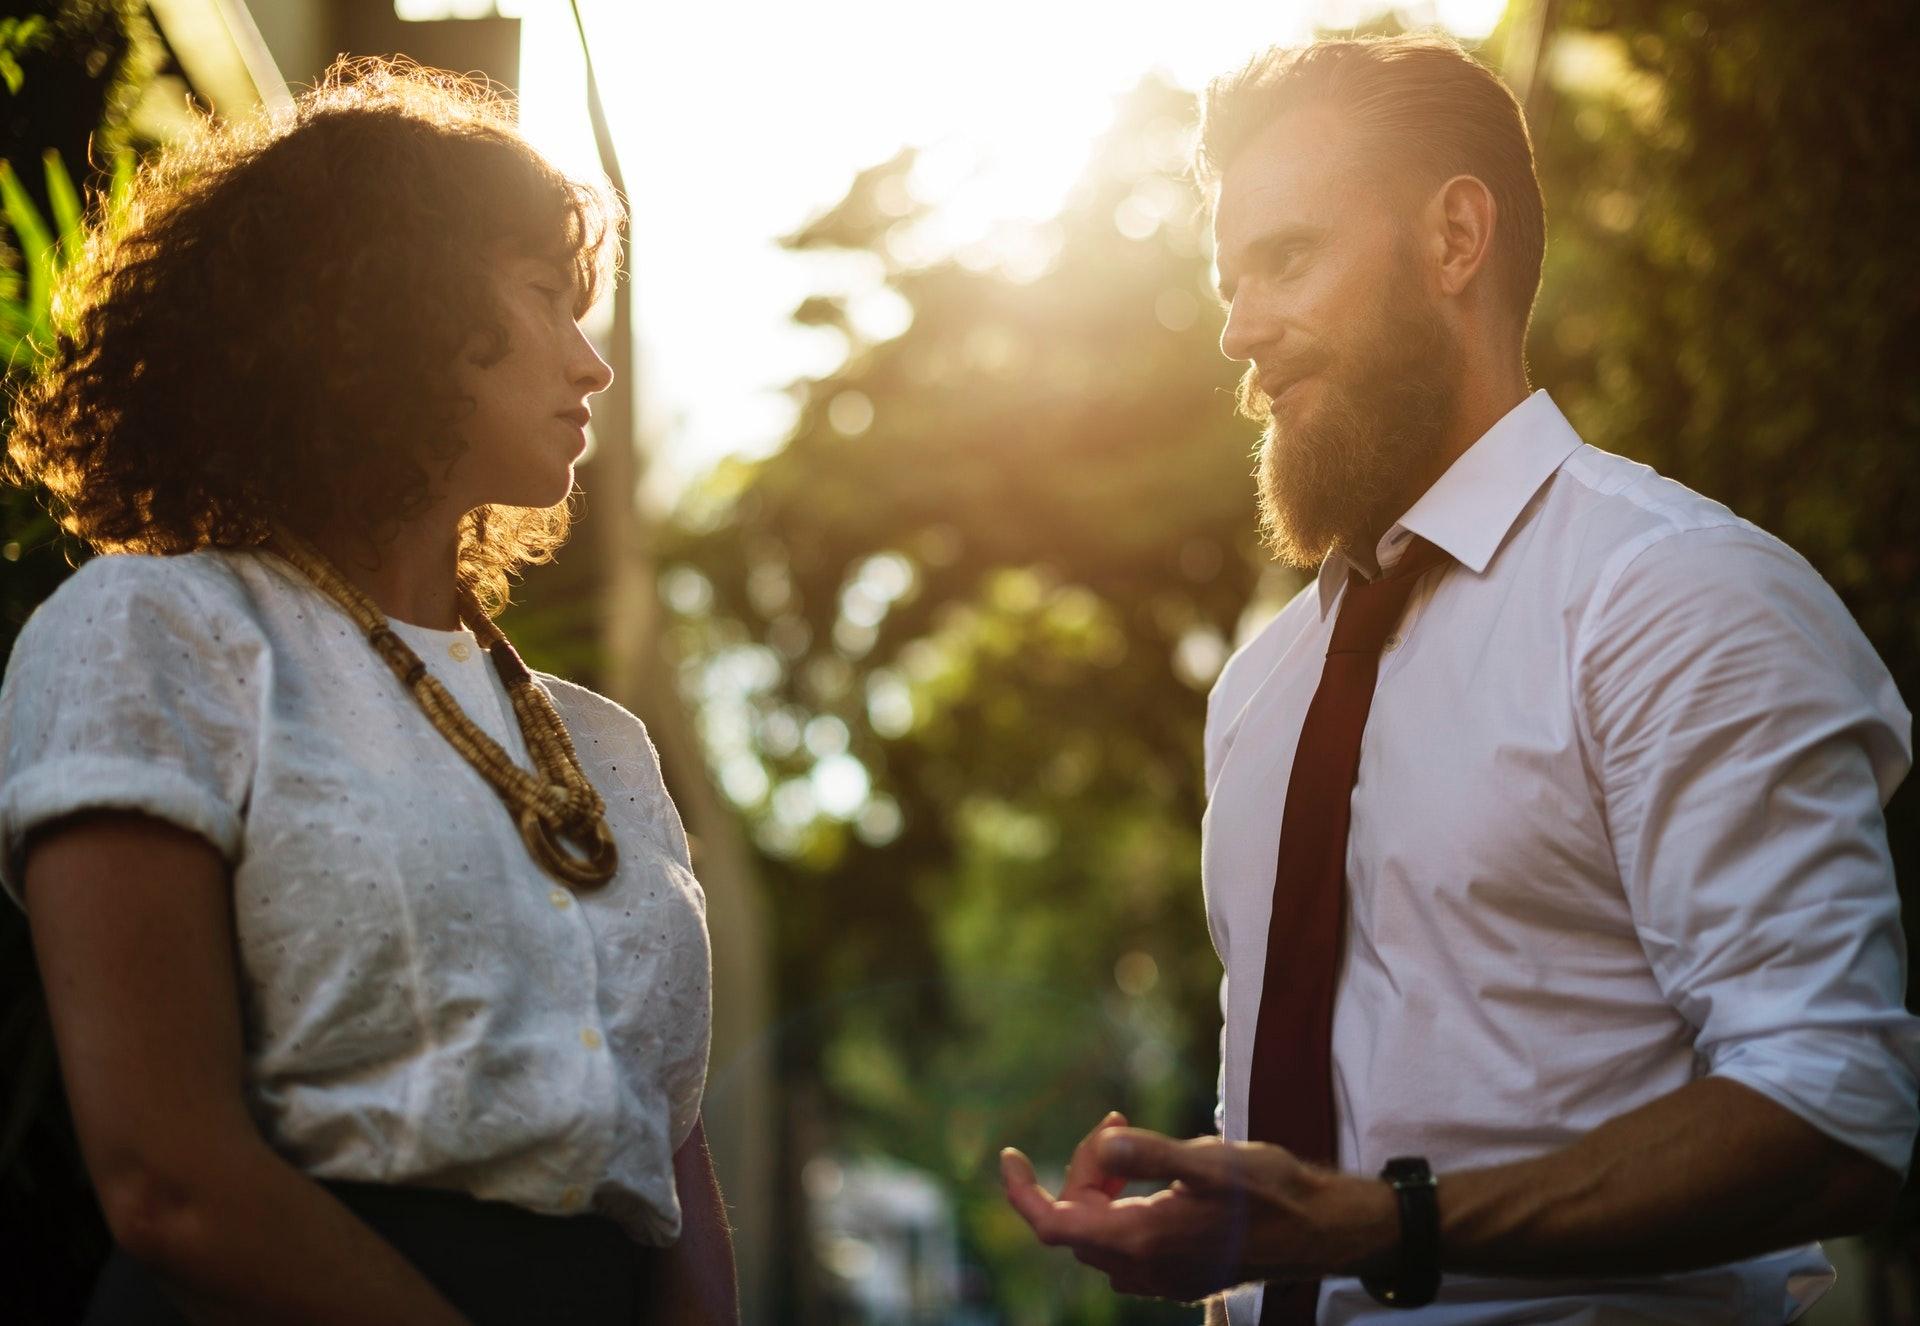 9 Genius Ways To Change Someone's Mind, According To Science